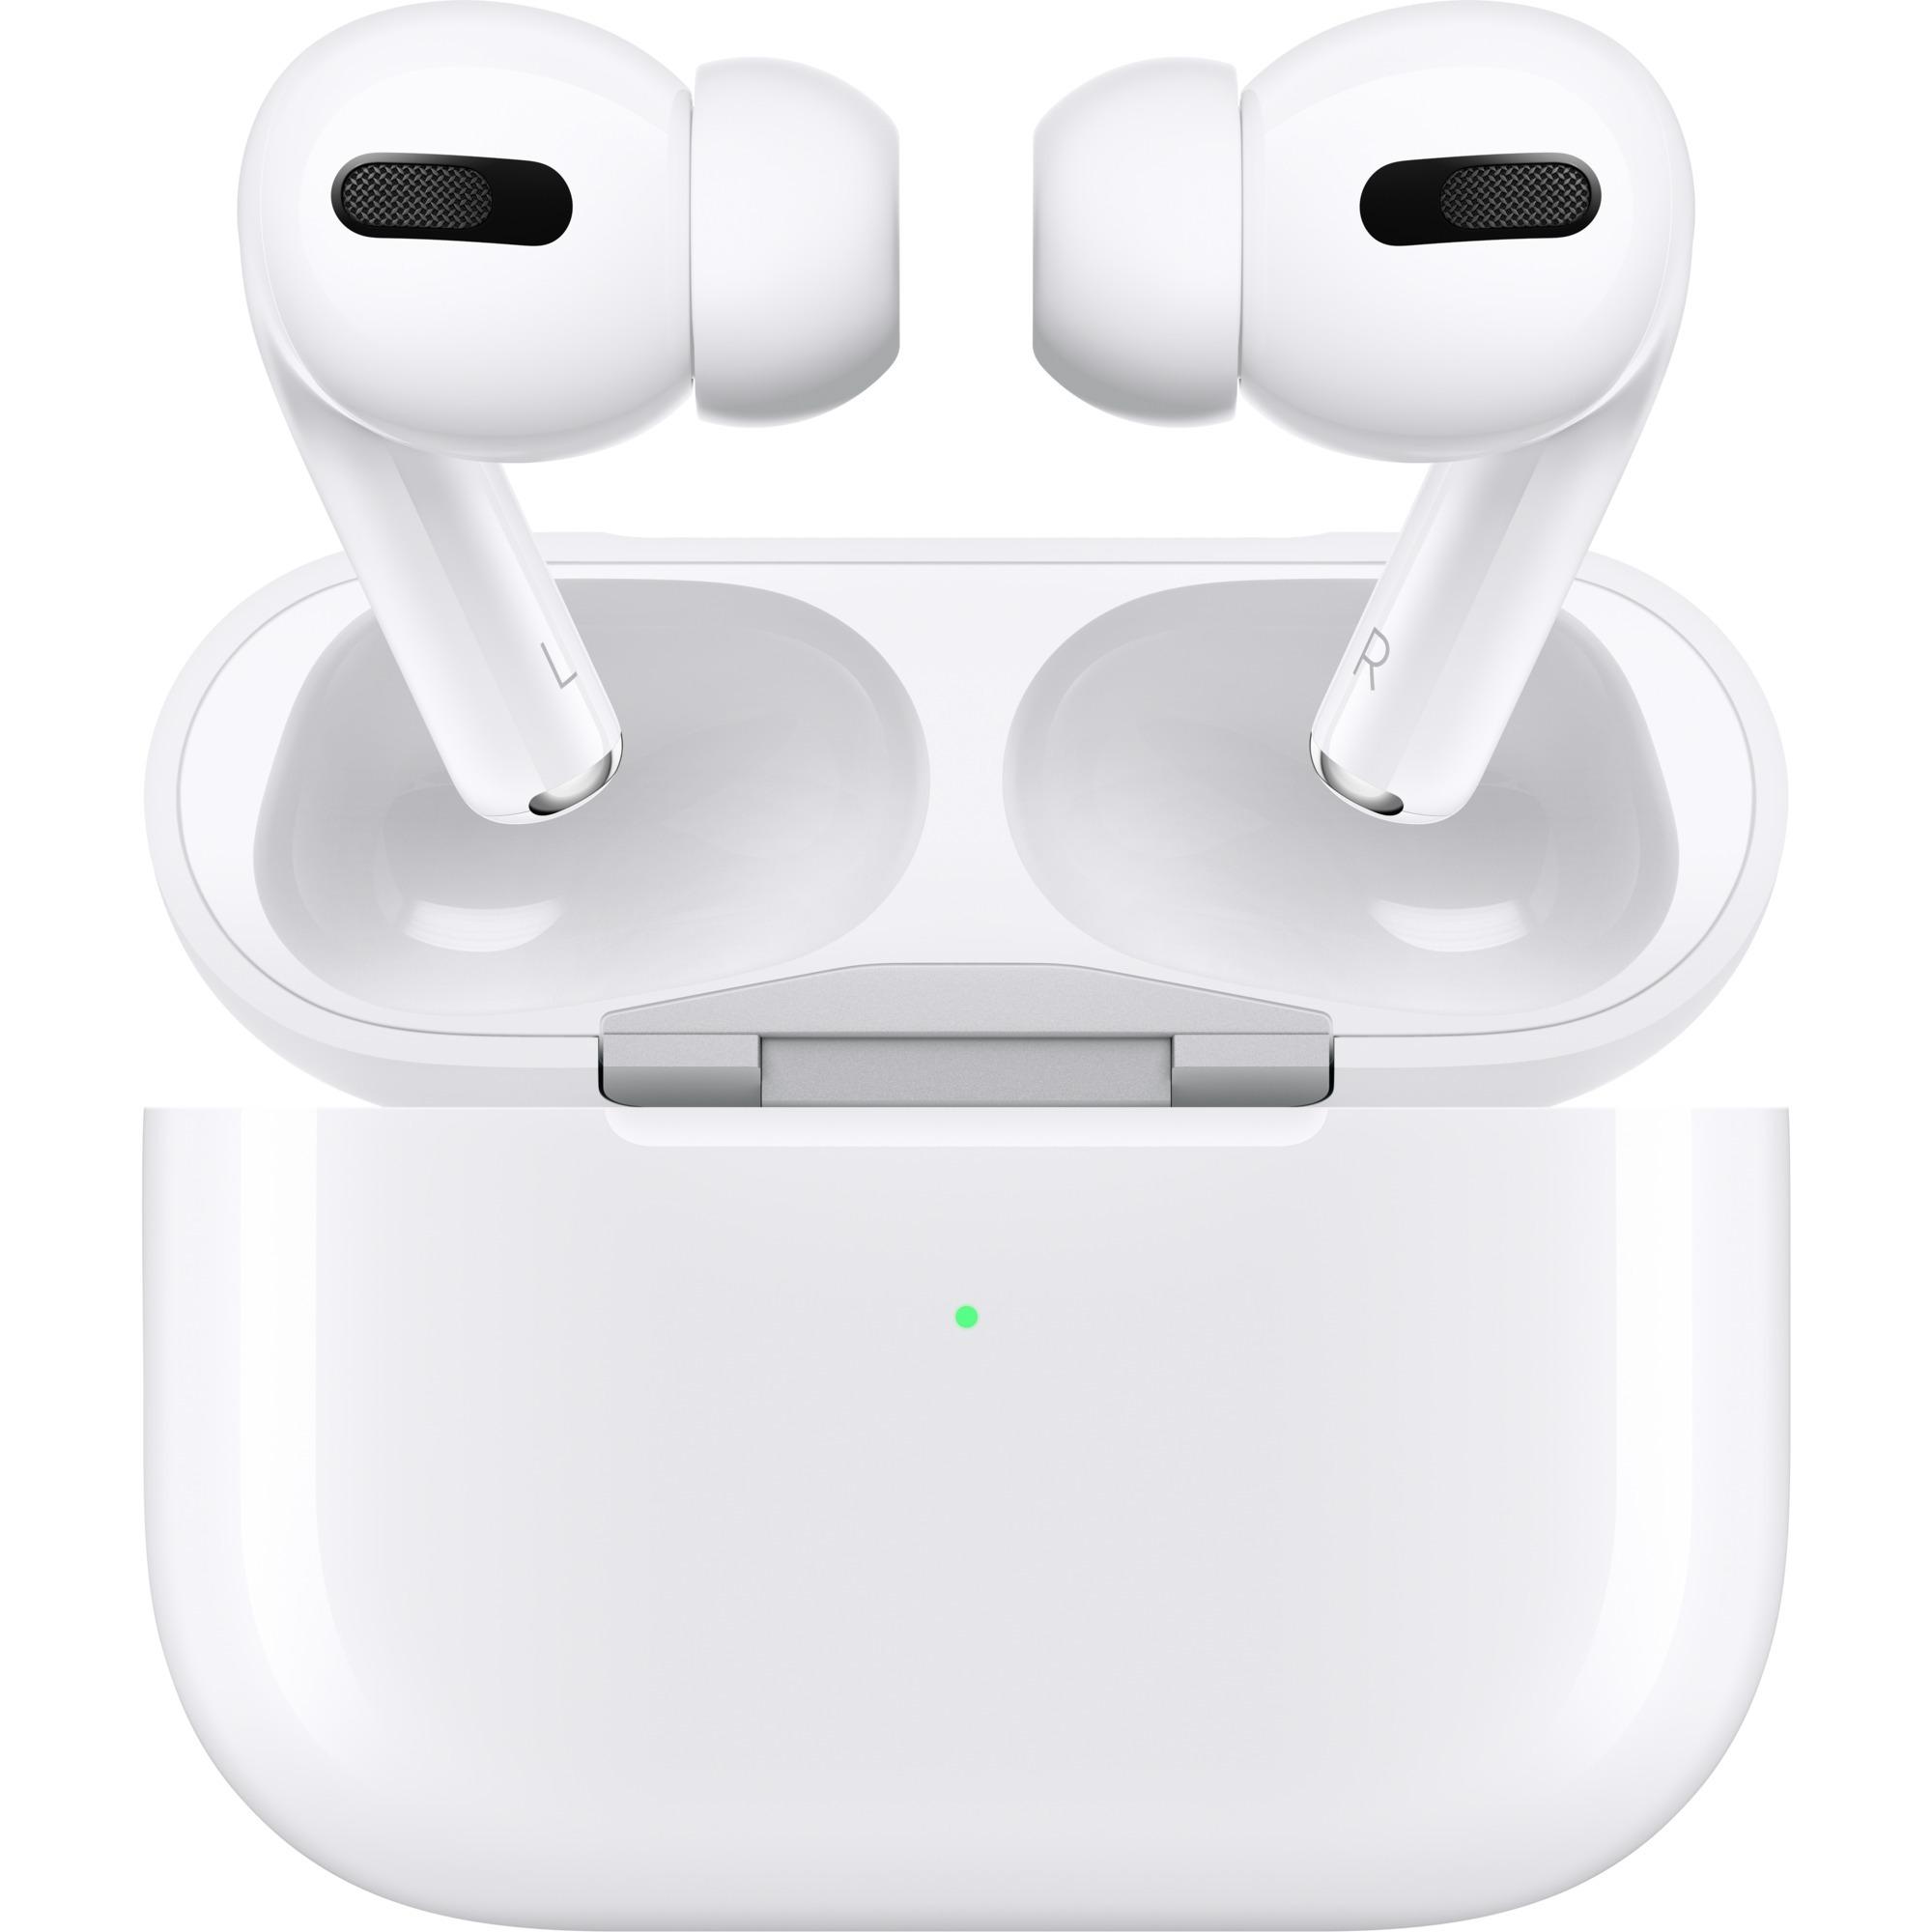 blanco 2 Pares Oreja Auriculares airpods caso para Apple iPhone 7 8 X Auriculares claro